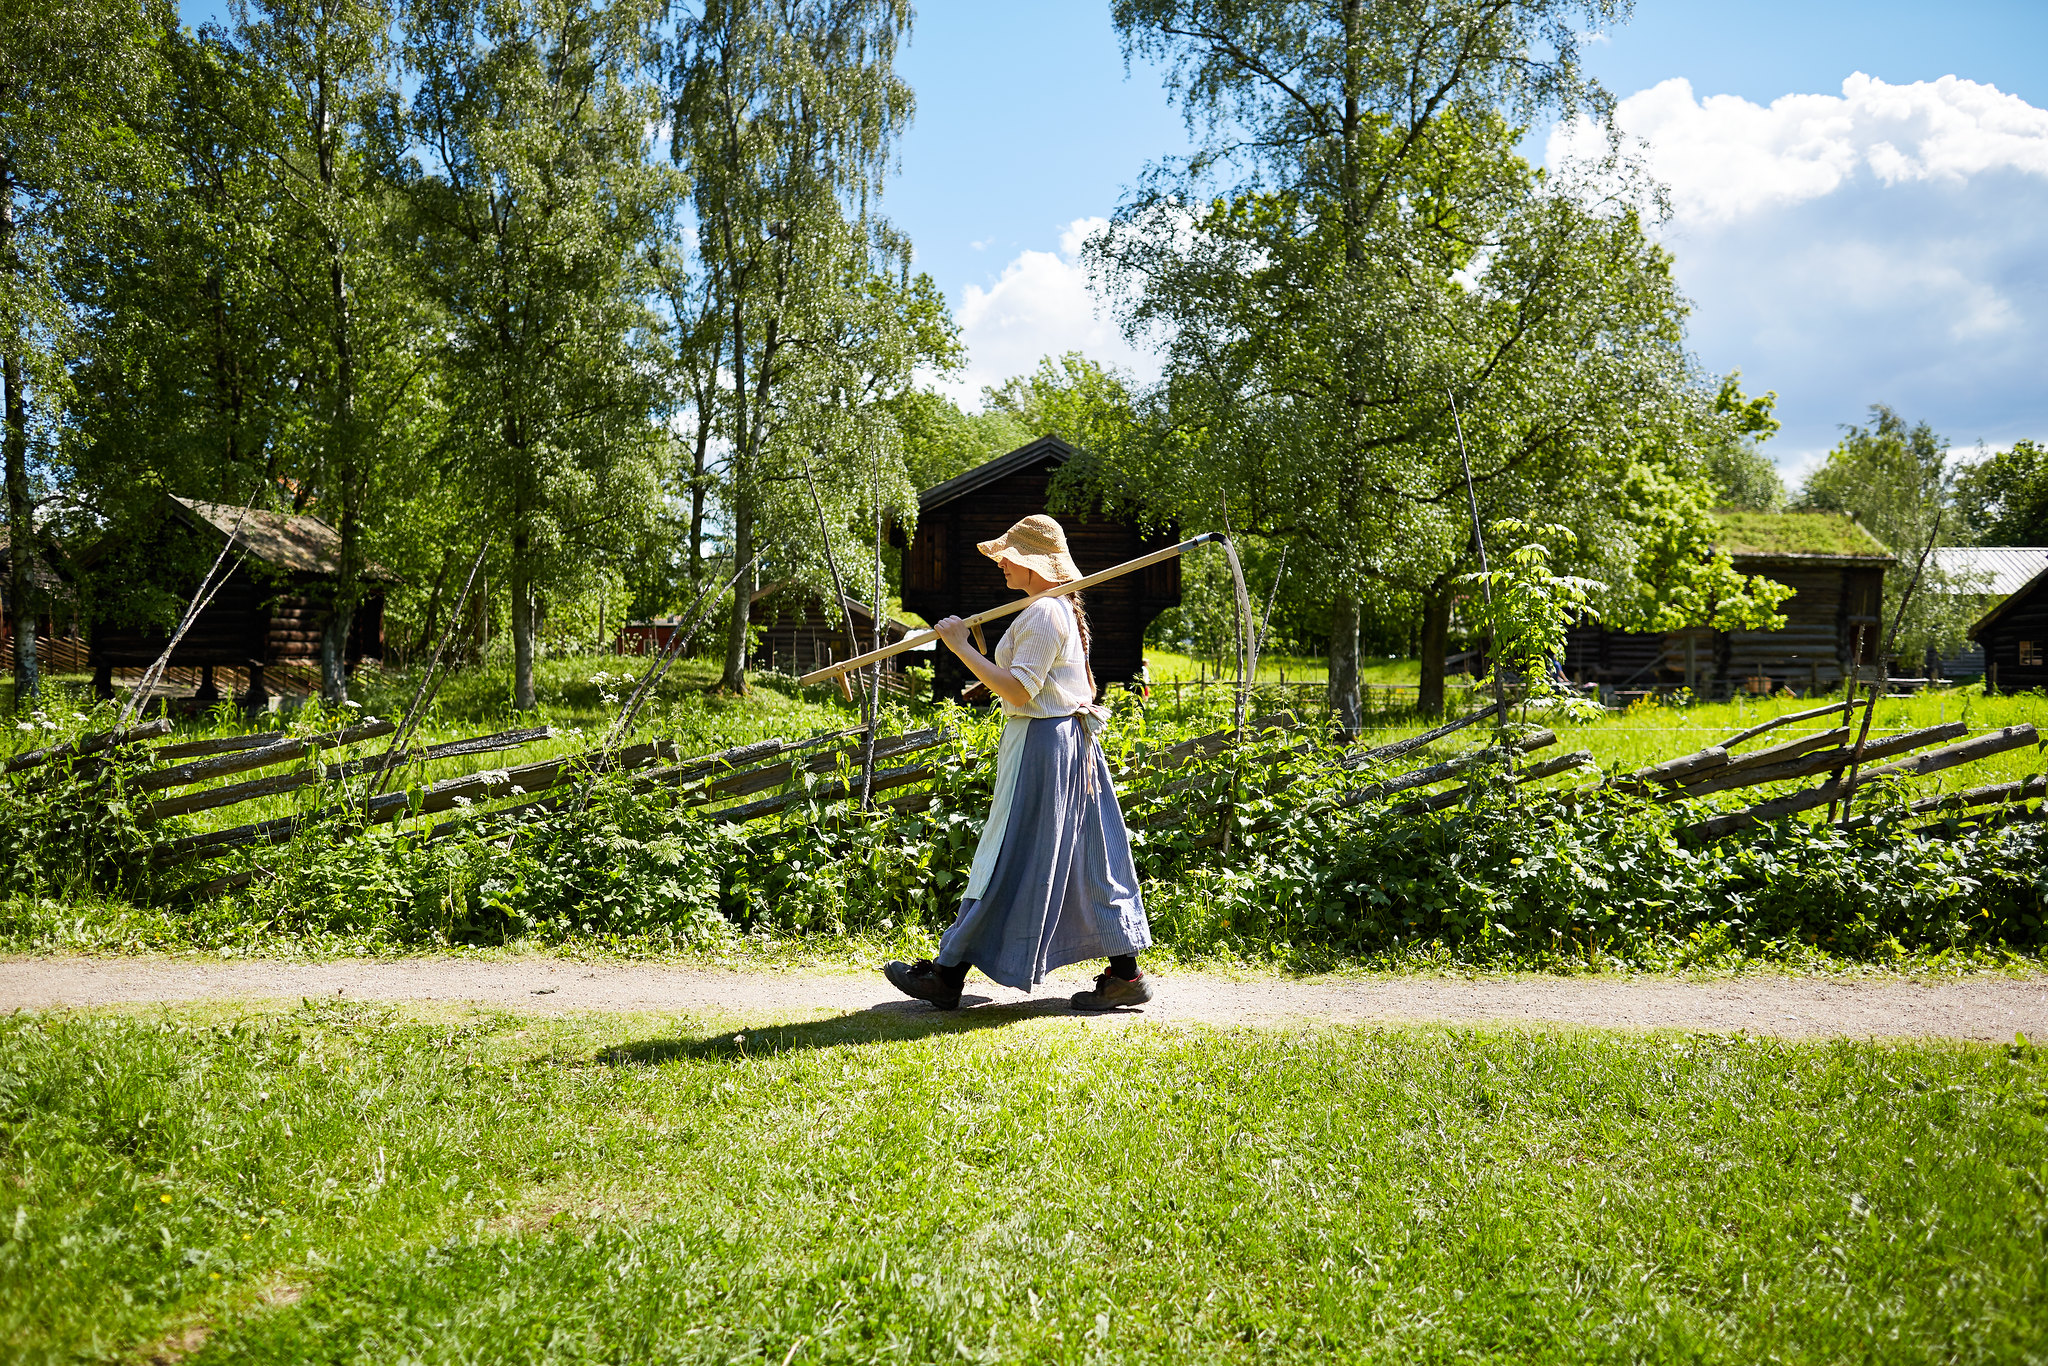 norsk_folkemuseum_a_walk_through_history.jpg